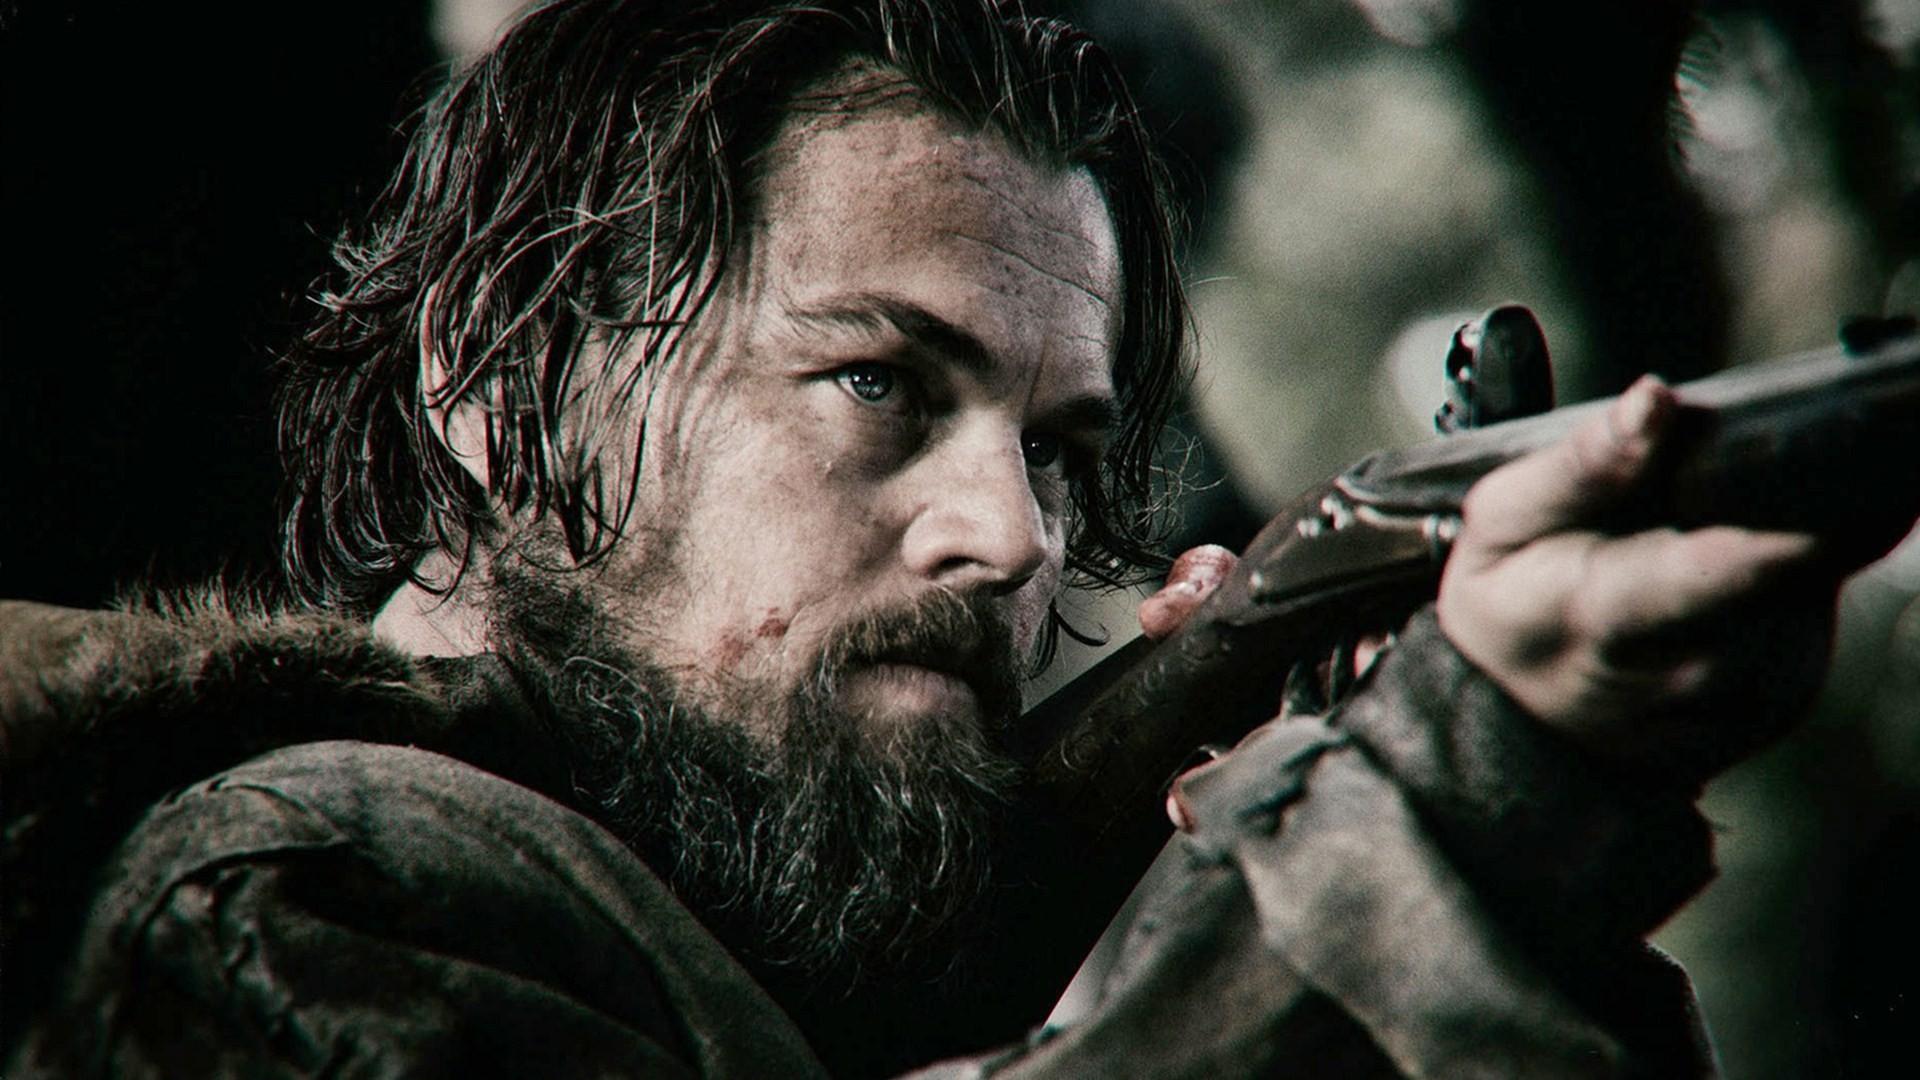 Leonardo DiCaprio Finally, Finally Won His Oscar: Watch His History-Making AcceptanceSpeech images